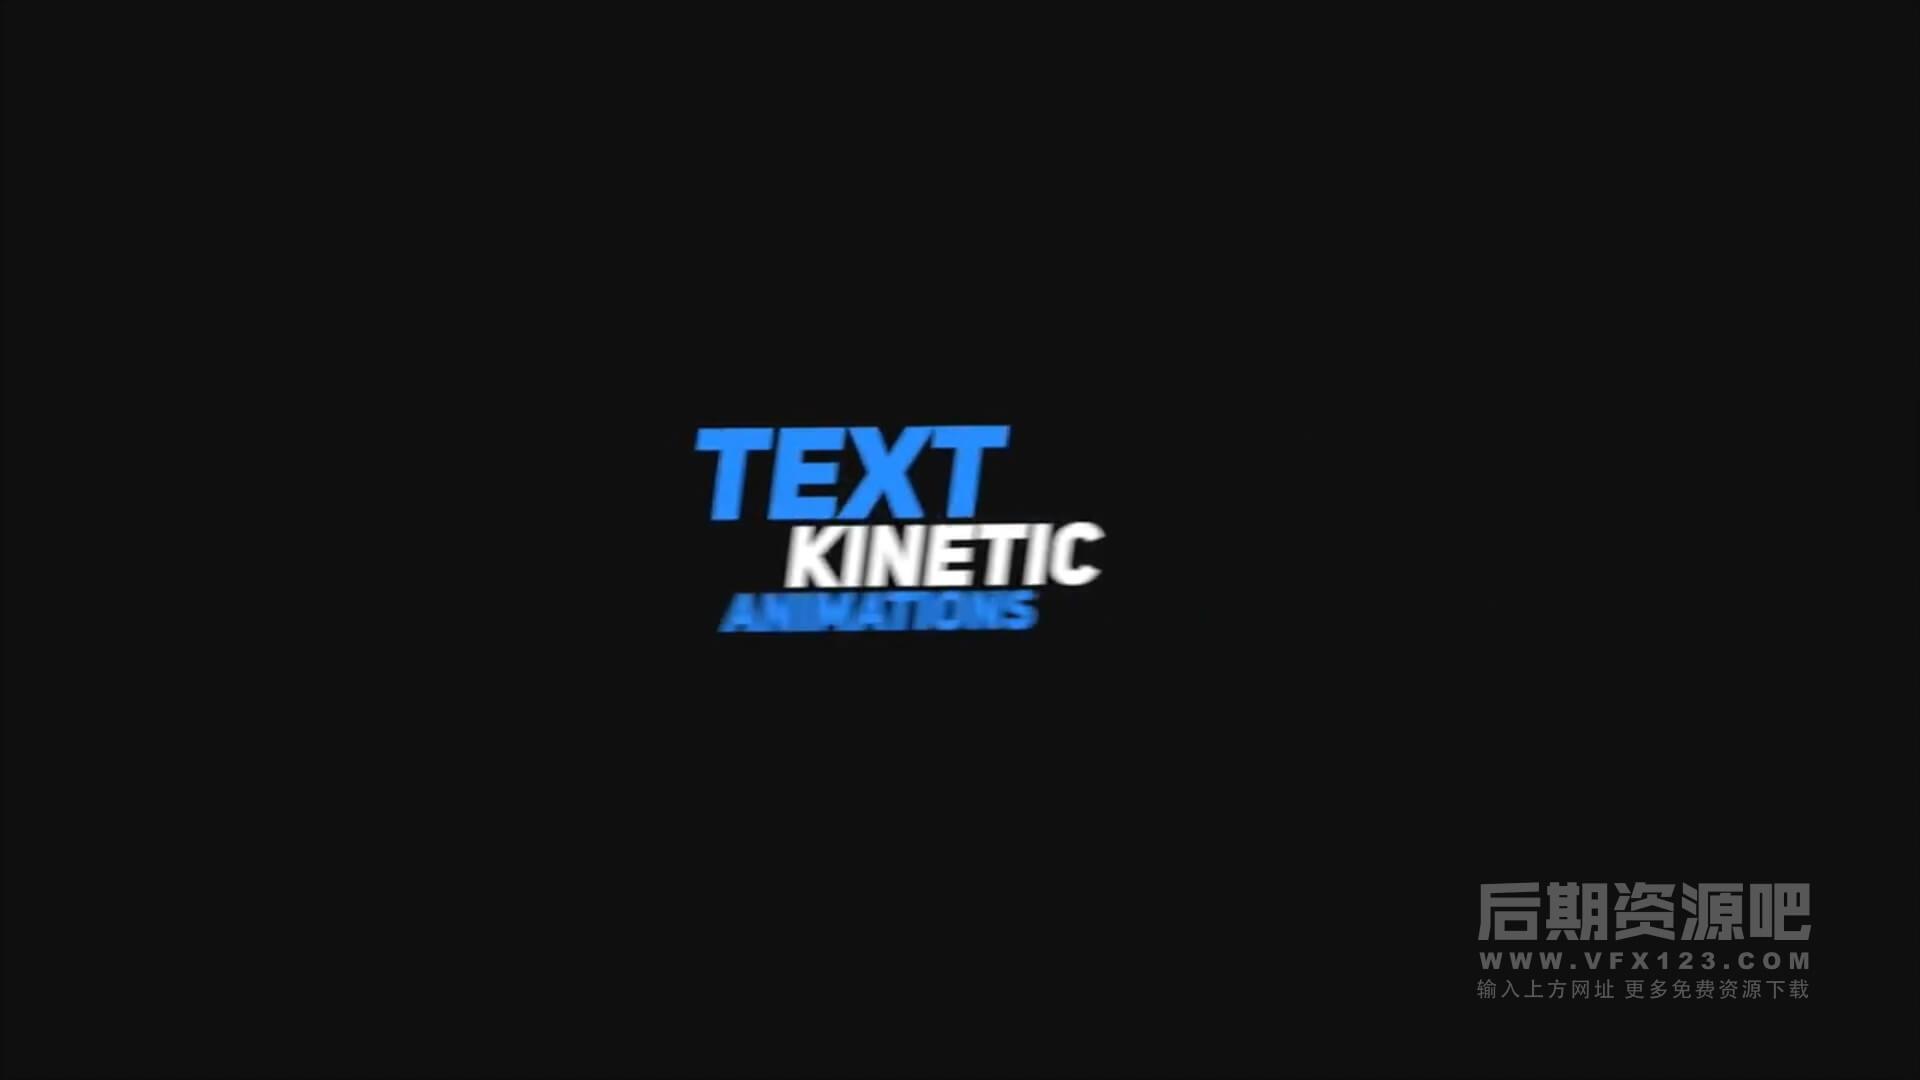 fcpx标题插件 20组快速旋转切入切出动画效果文字模板 Kinetic Typography